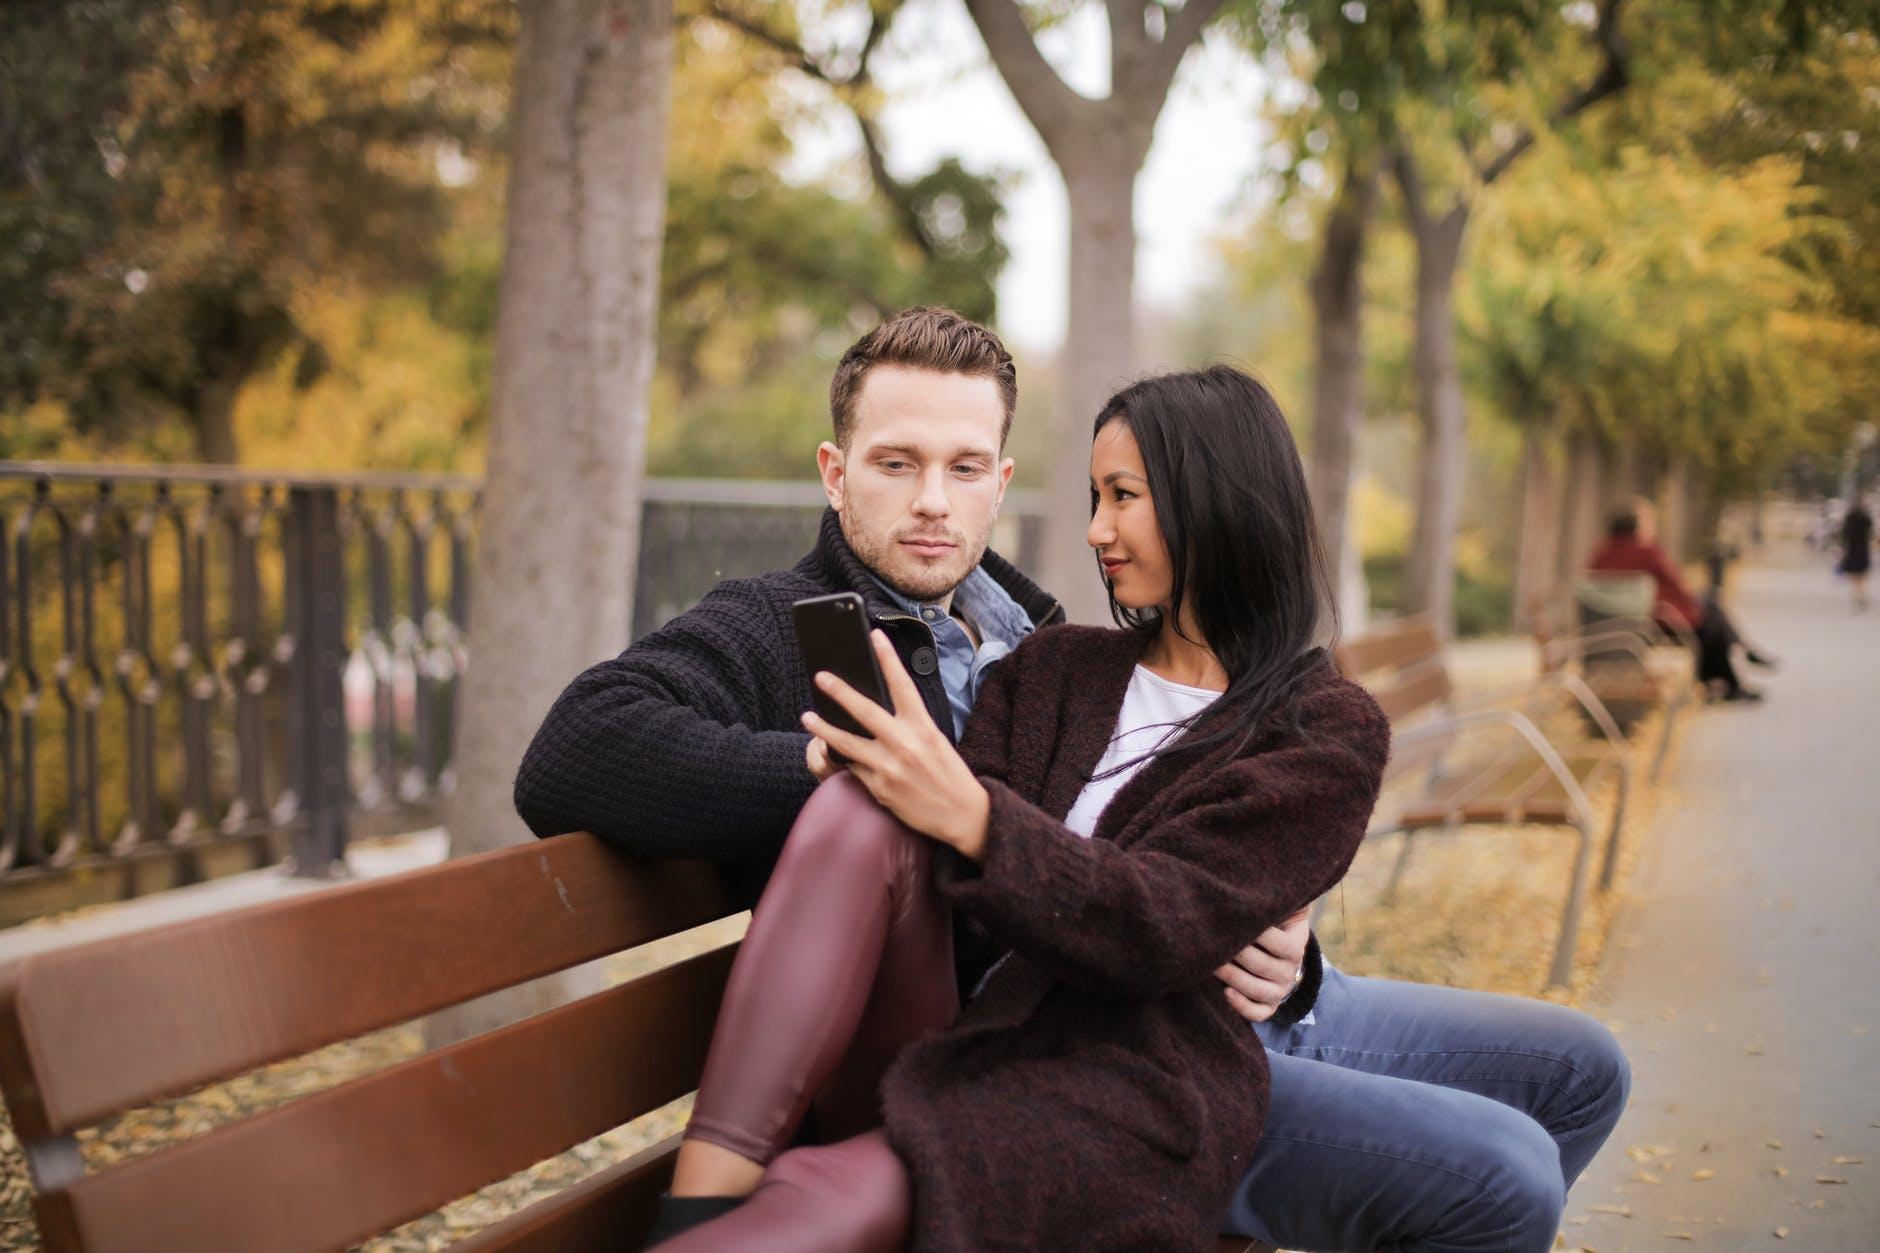 Ljubavni horoskop za travanj – usprkos svemu ljubav je u zraku!